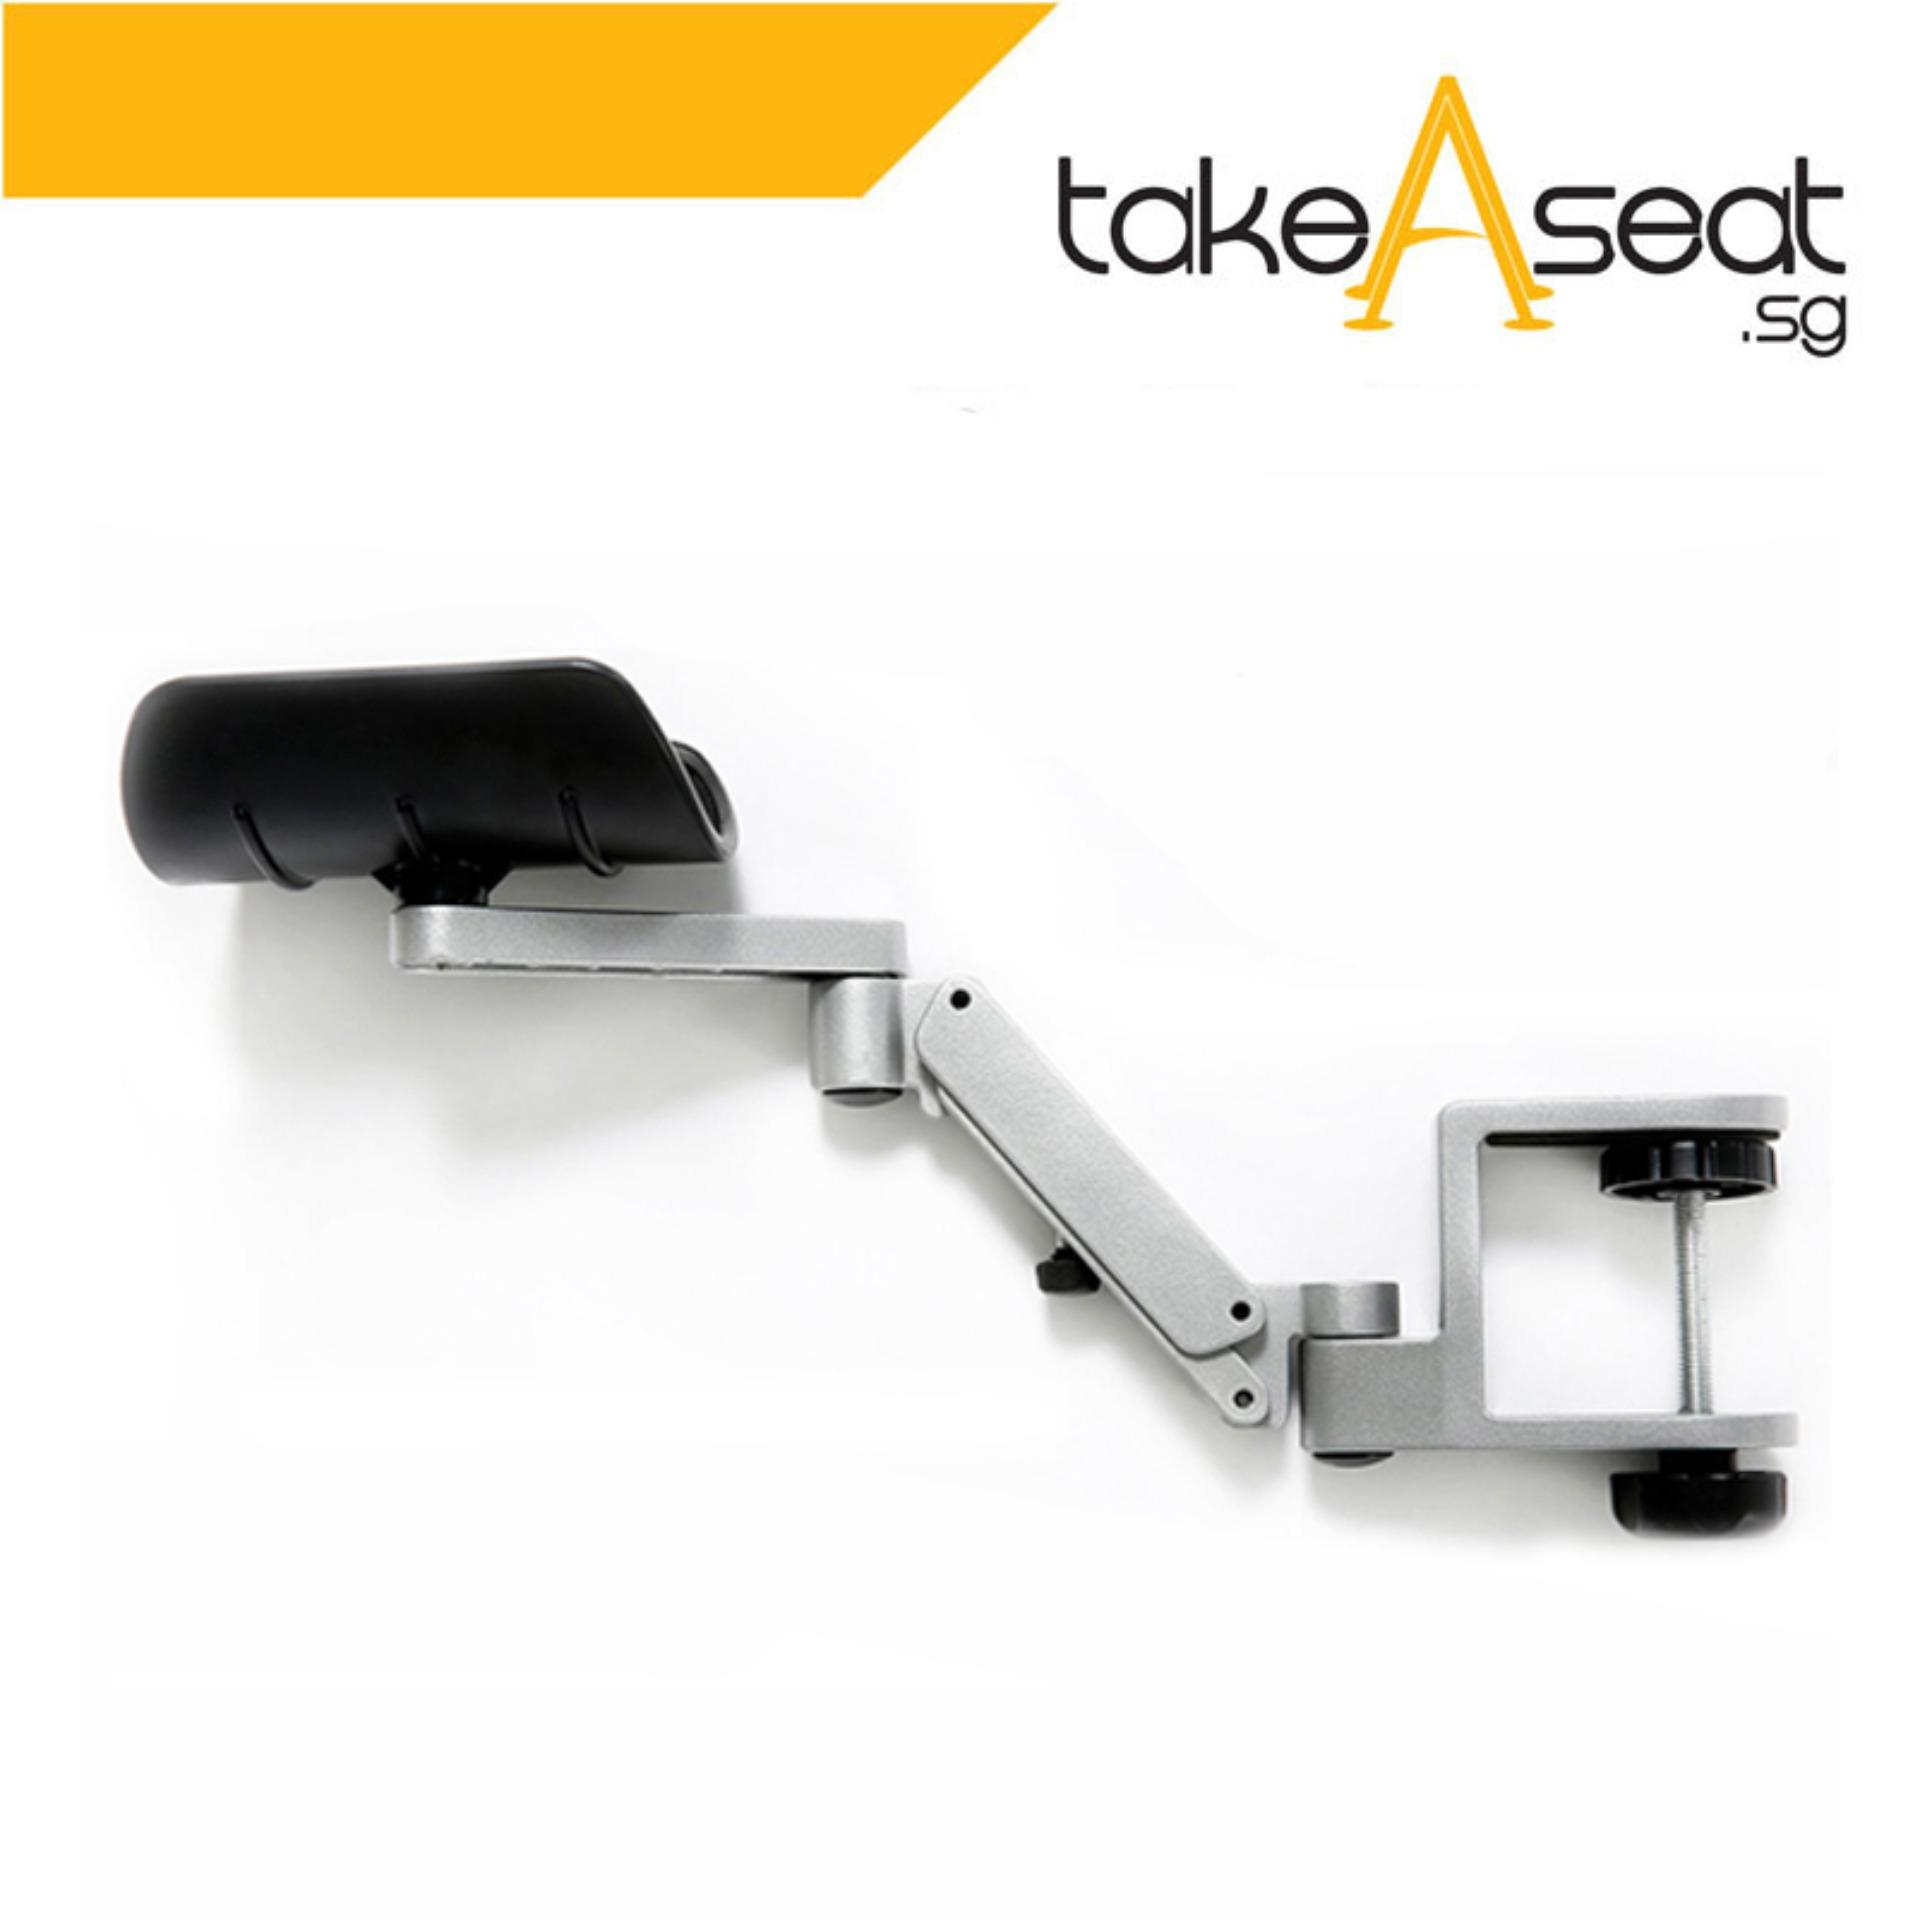 Desk Arm Support (Adjustable Height)